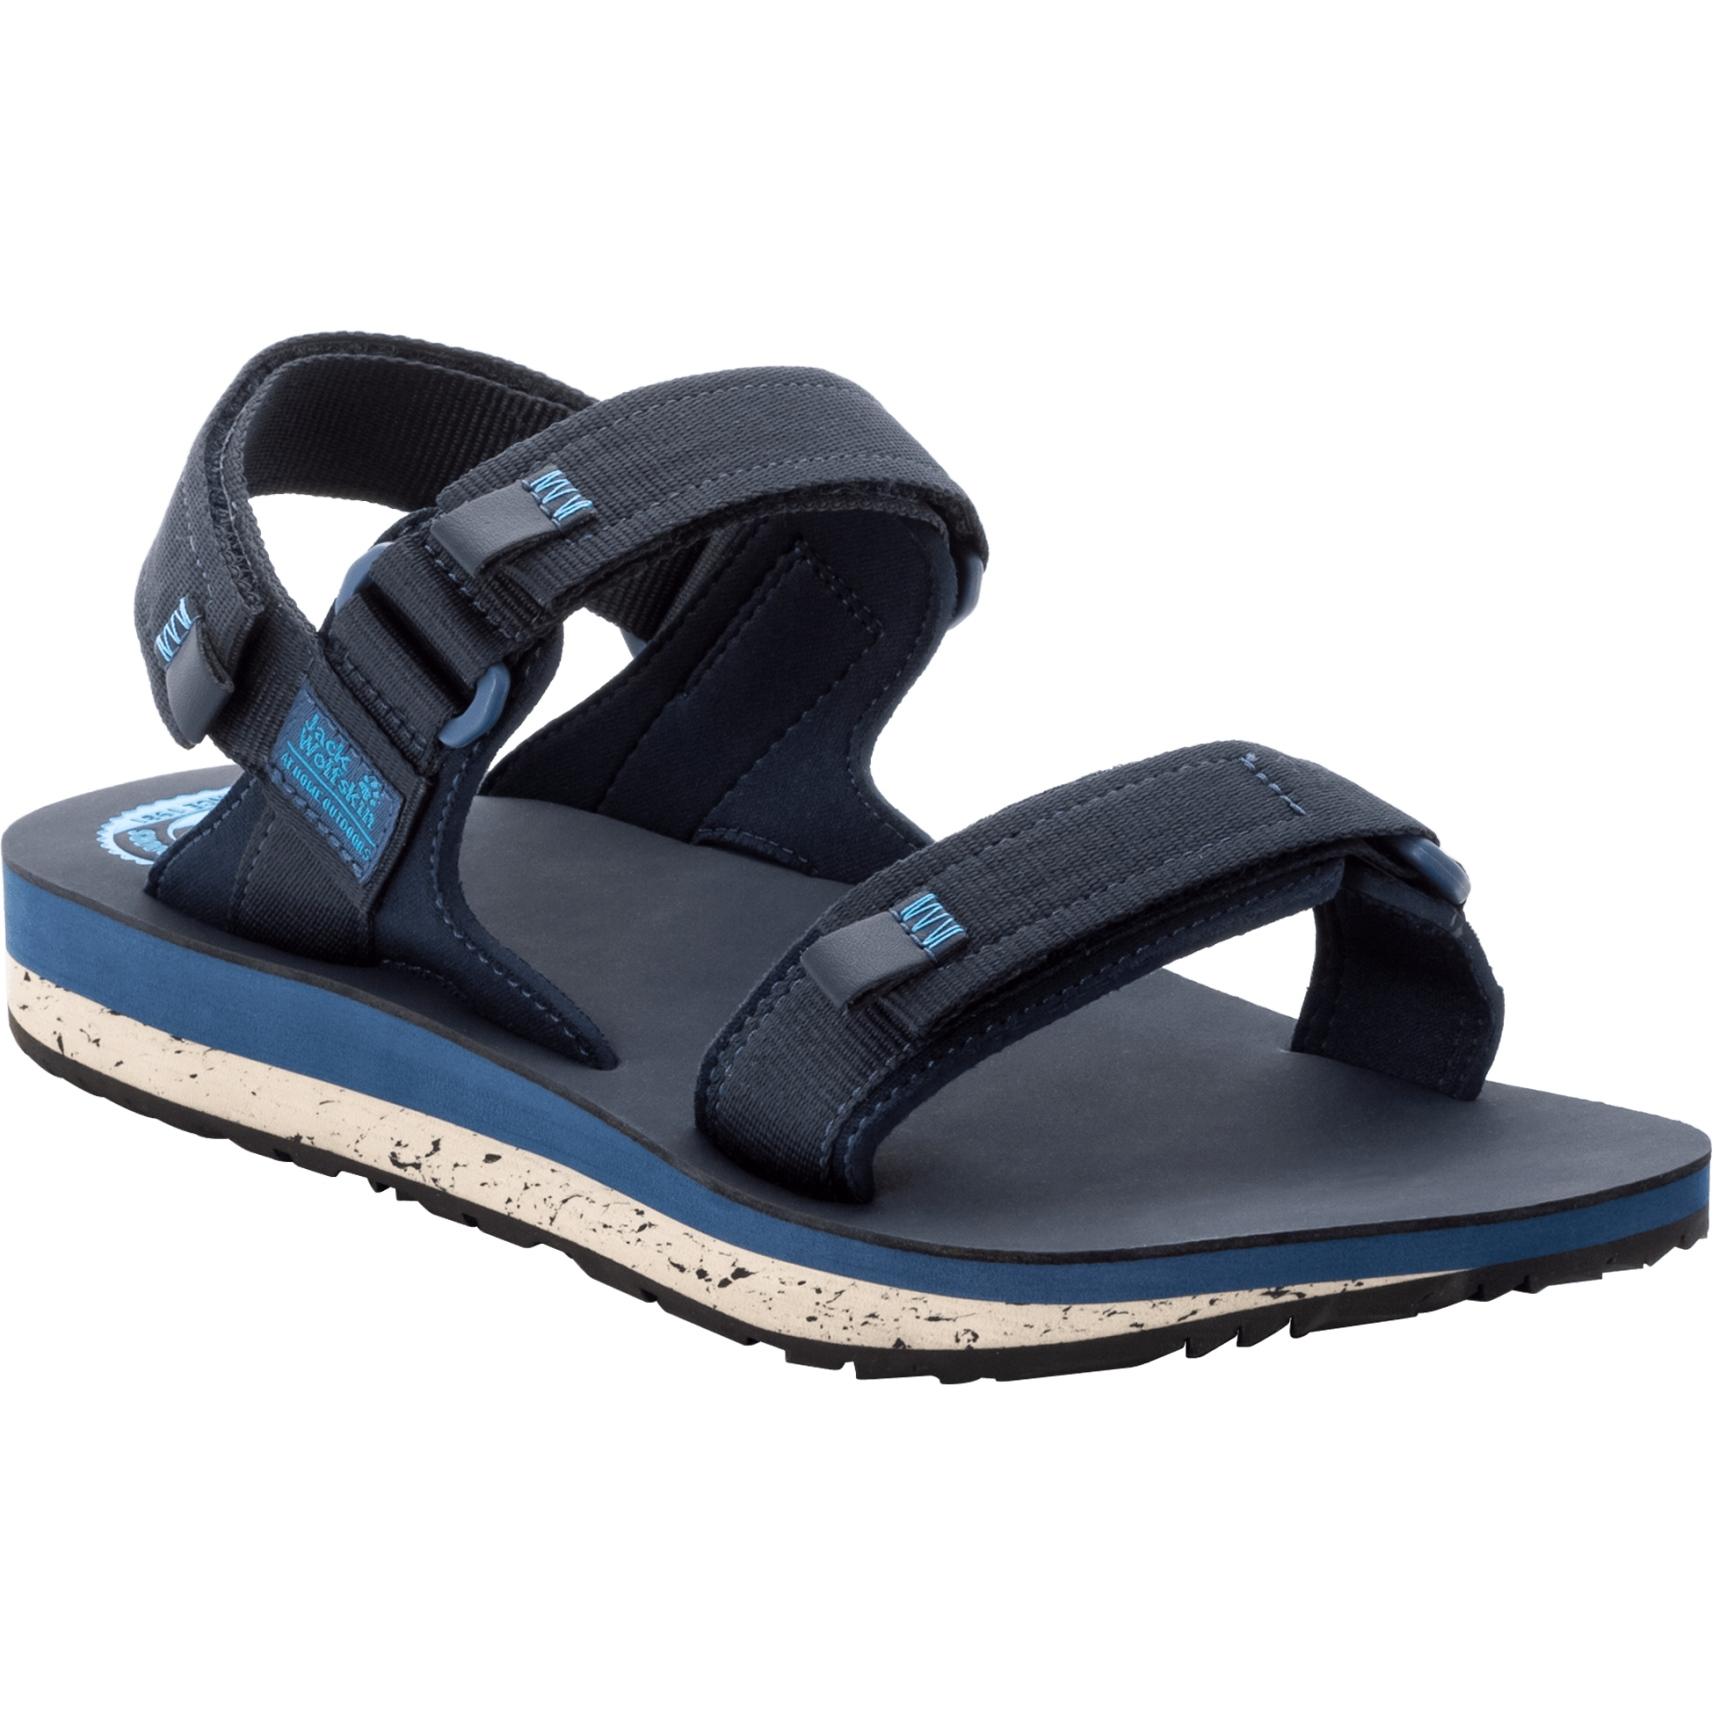 Jack Wolfskin Outfresh Deluxe Sandal M - dark blue/blue